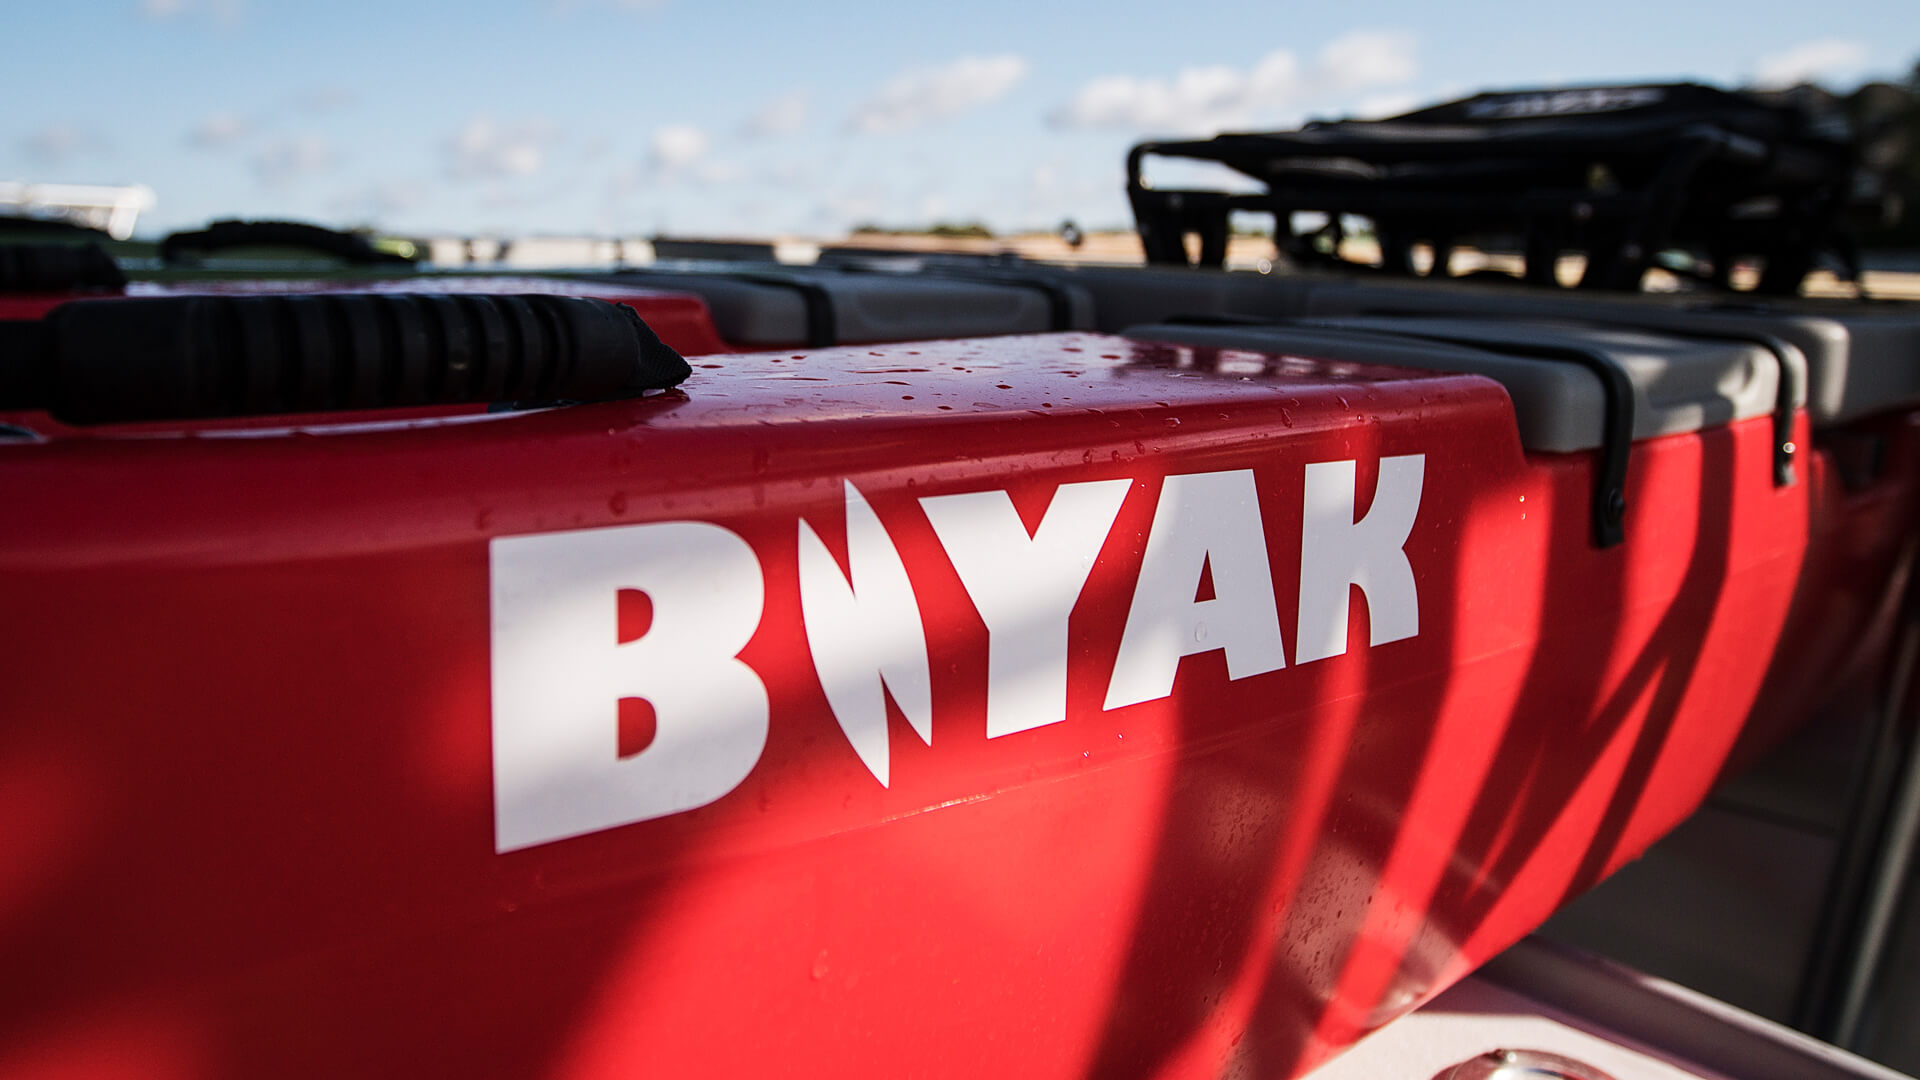 Biyak-thumbnail